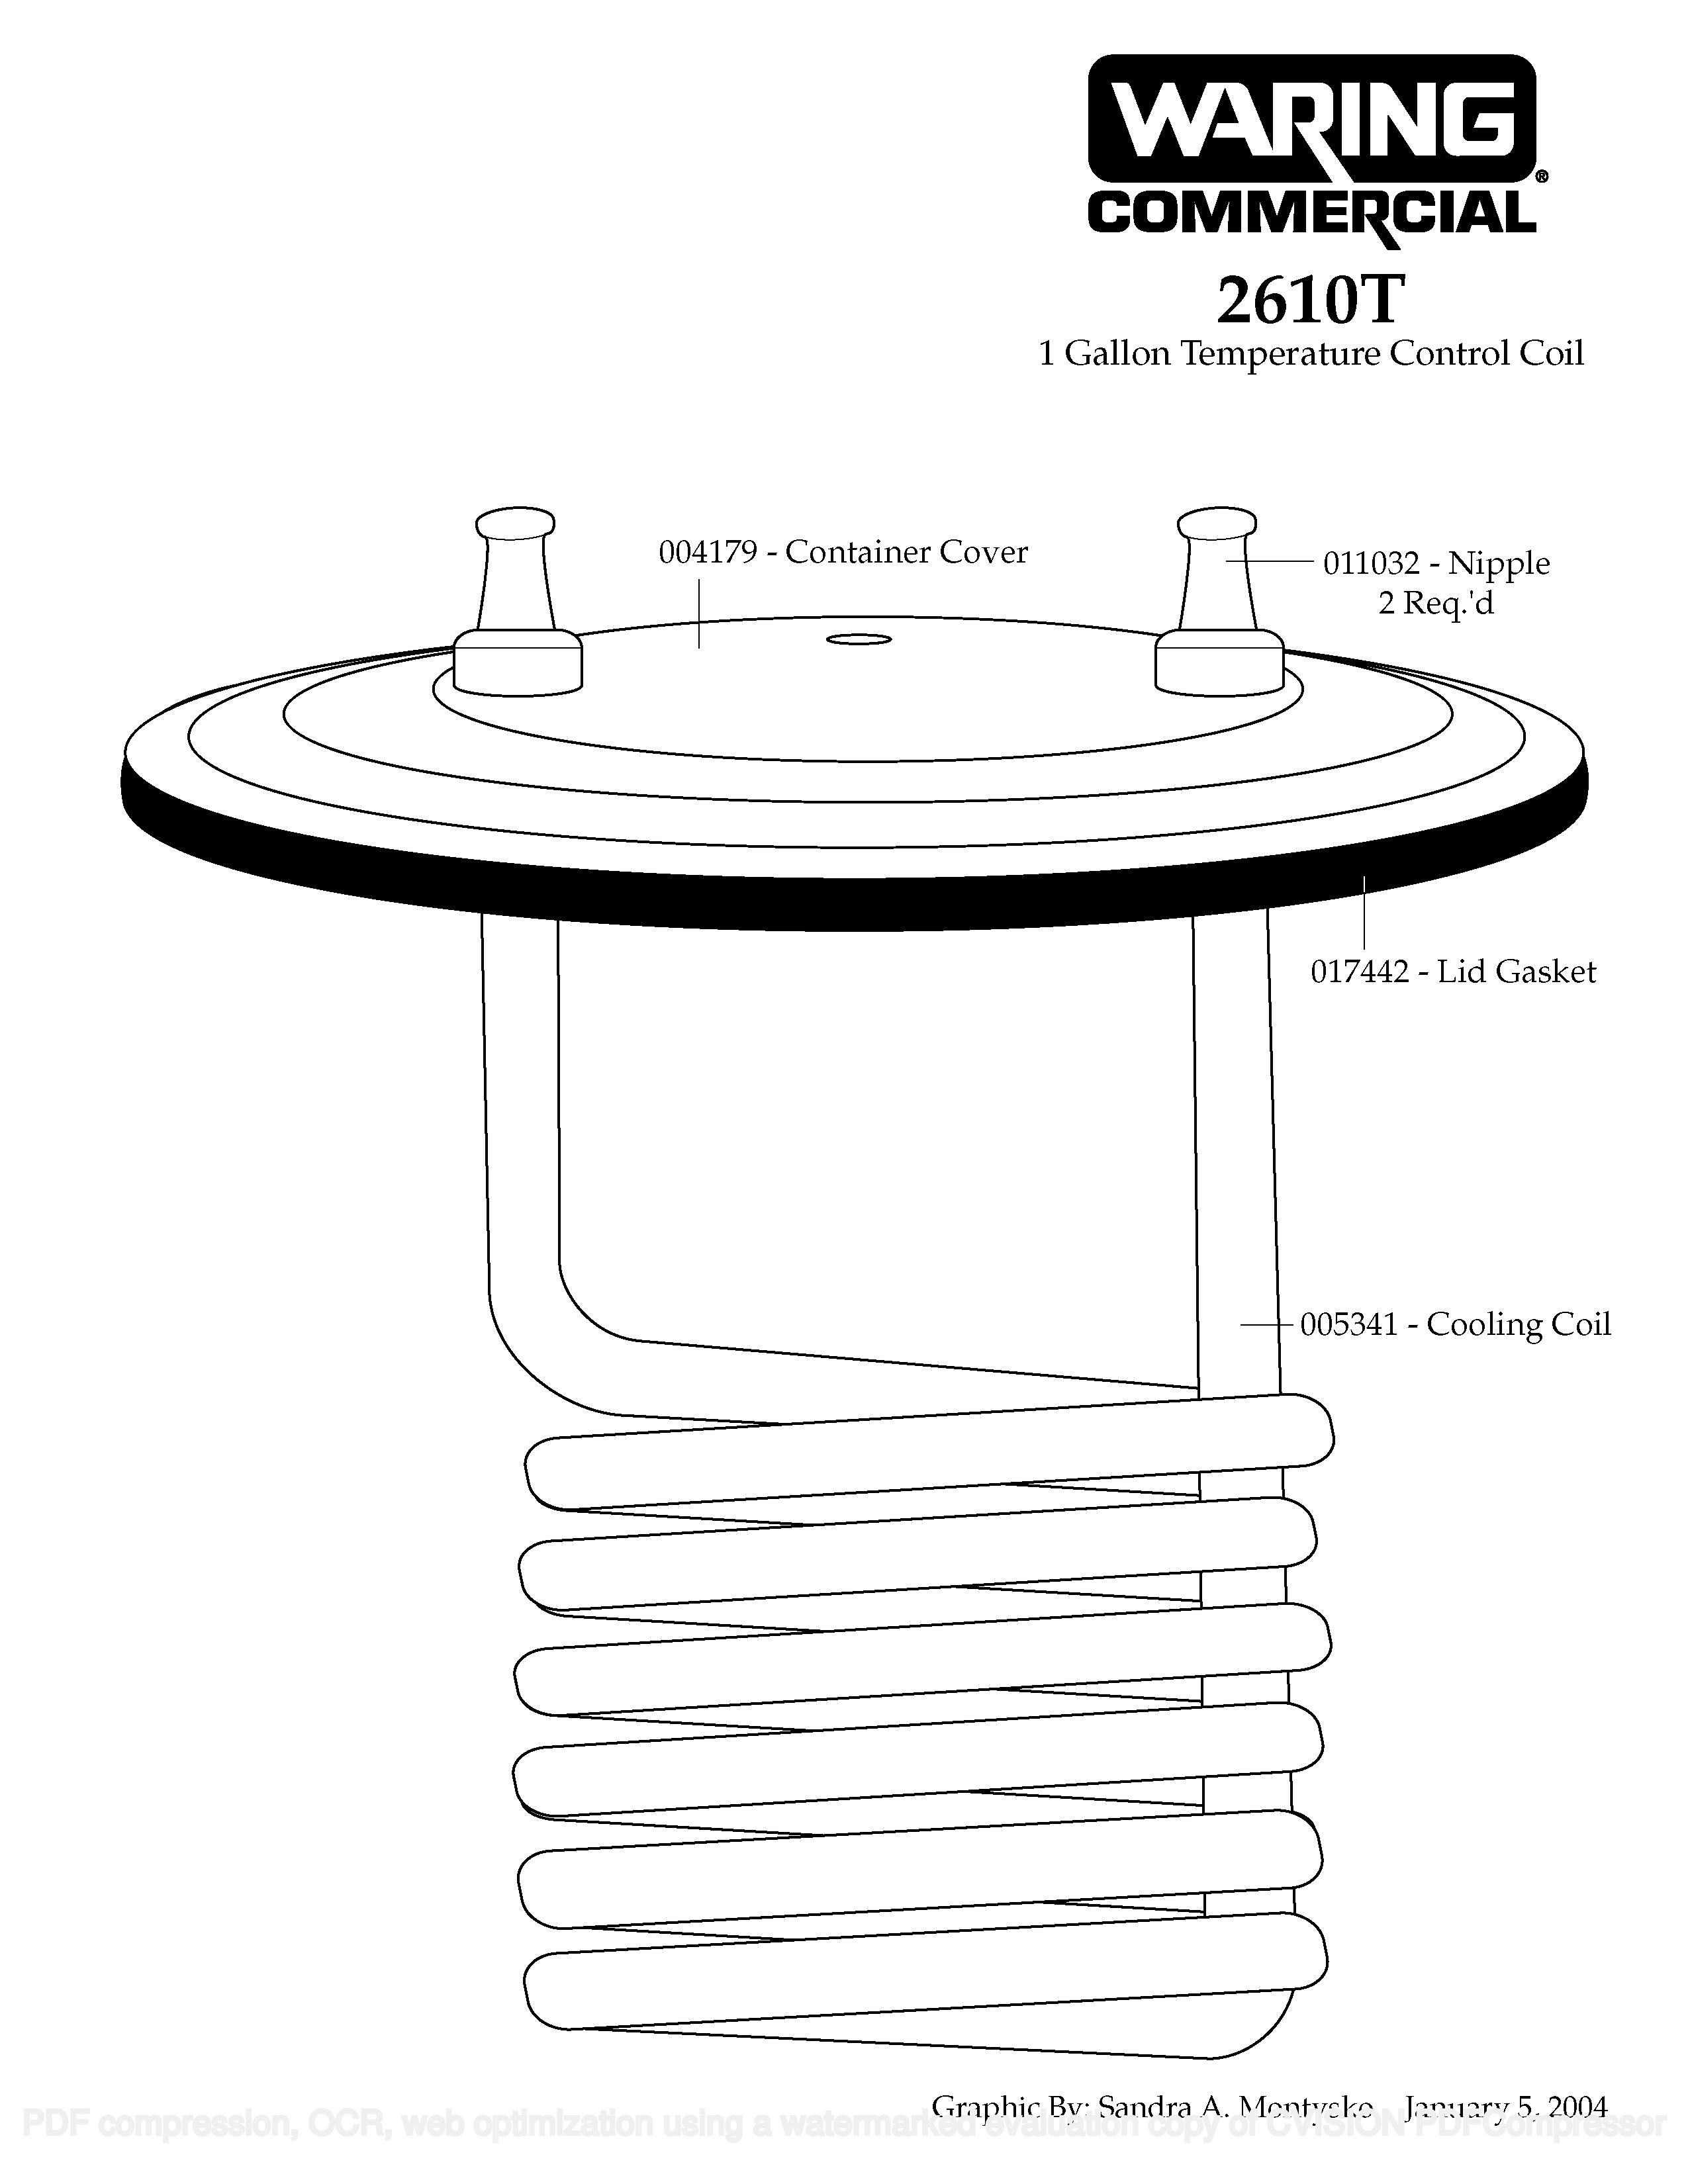 Катушка контроля температуры Waring 2610T Temperature Control Coil